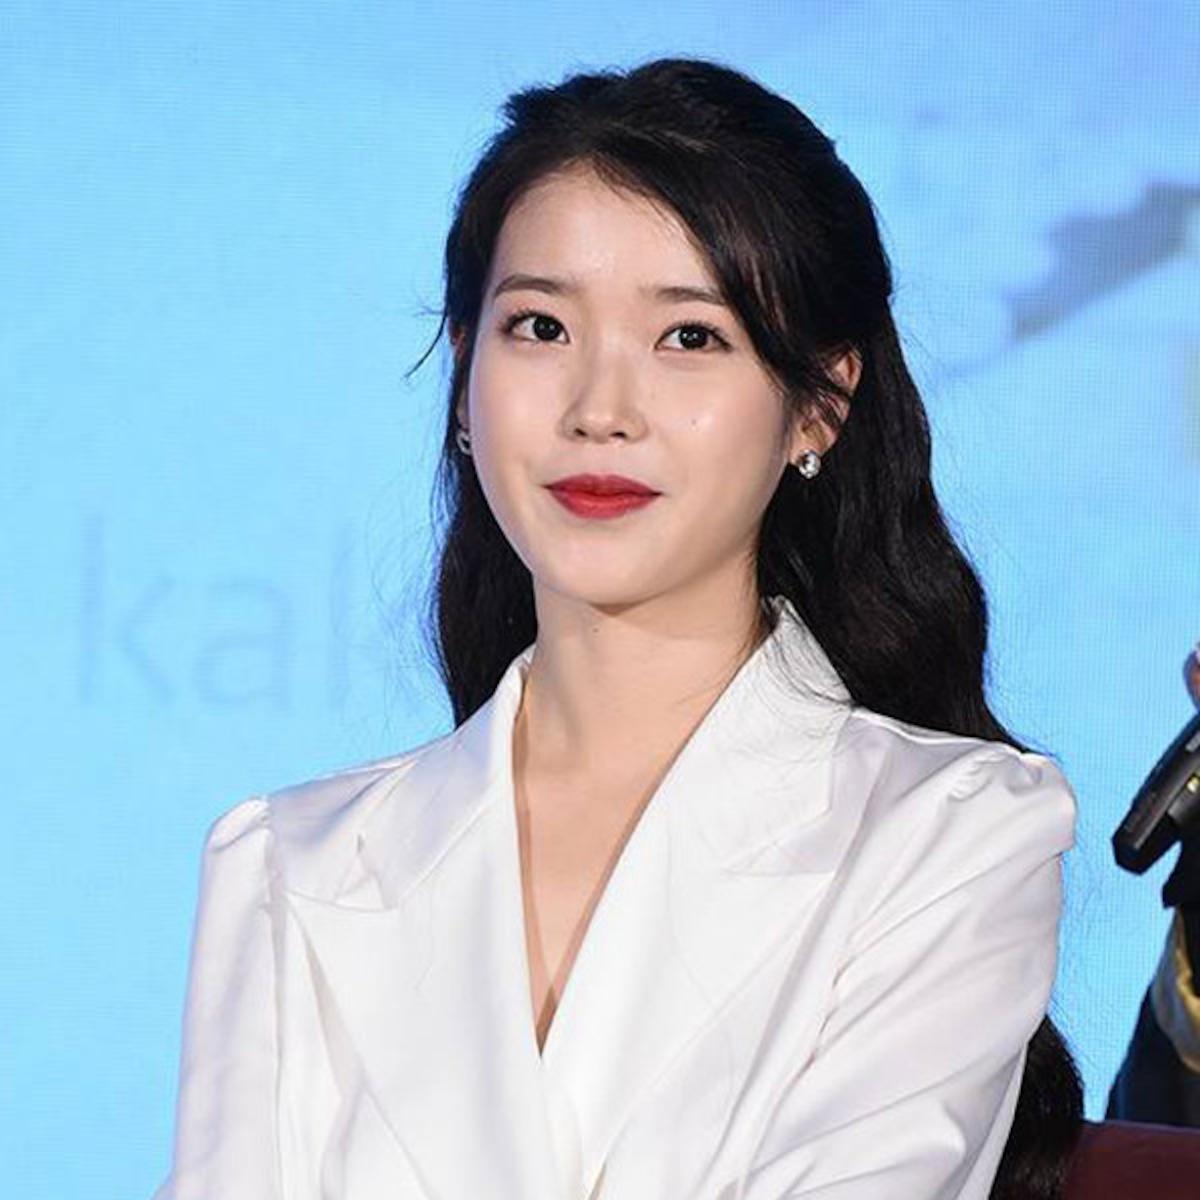 K-Pop Star IU Hits Golden Milestone - E! Online - AP